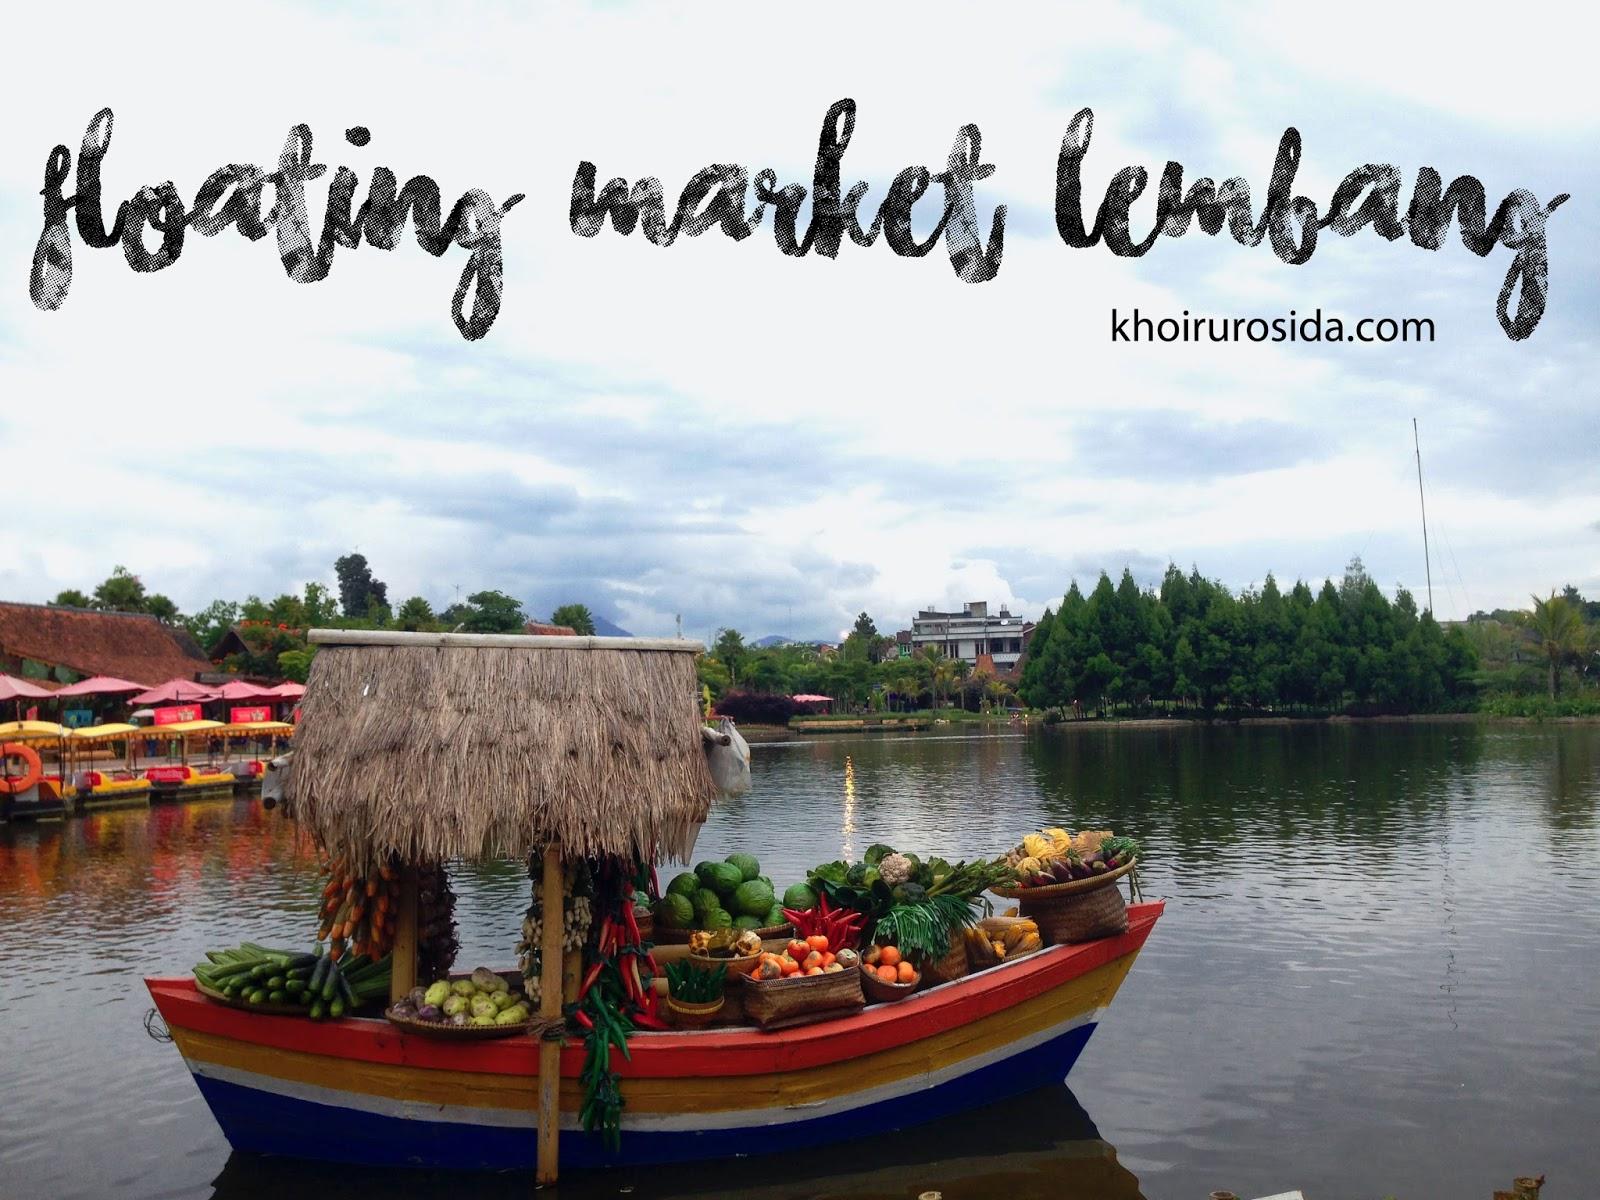 Keliling Bandung Jalan Floating Market Lembang Hari Bulan Februari 2016